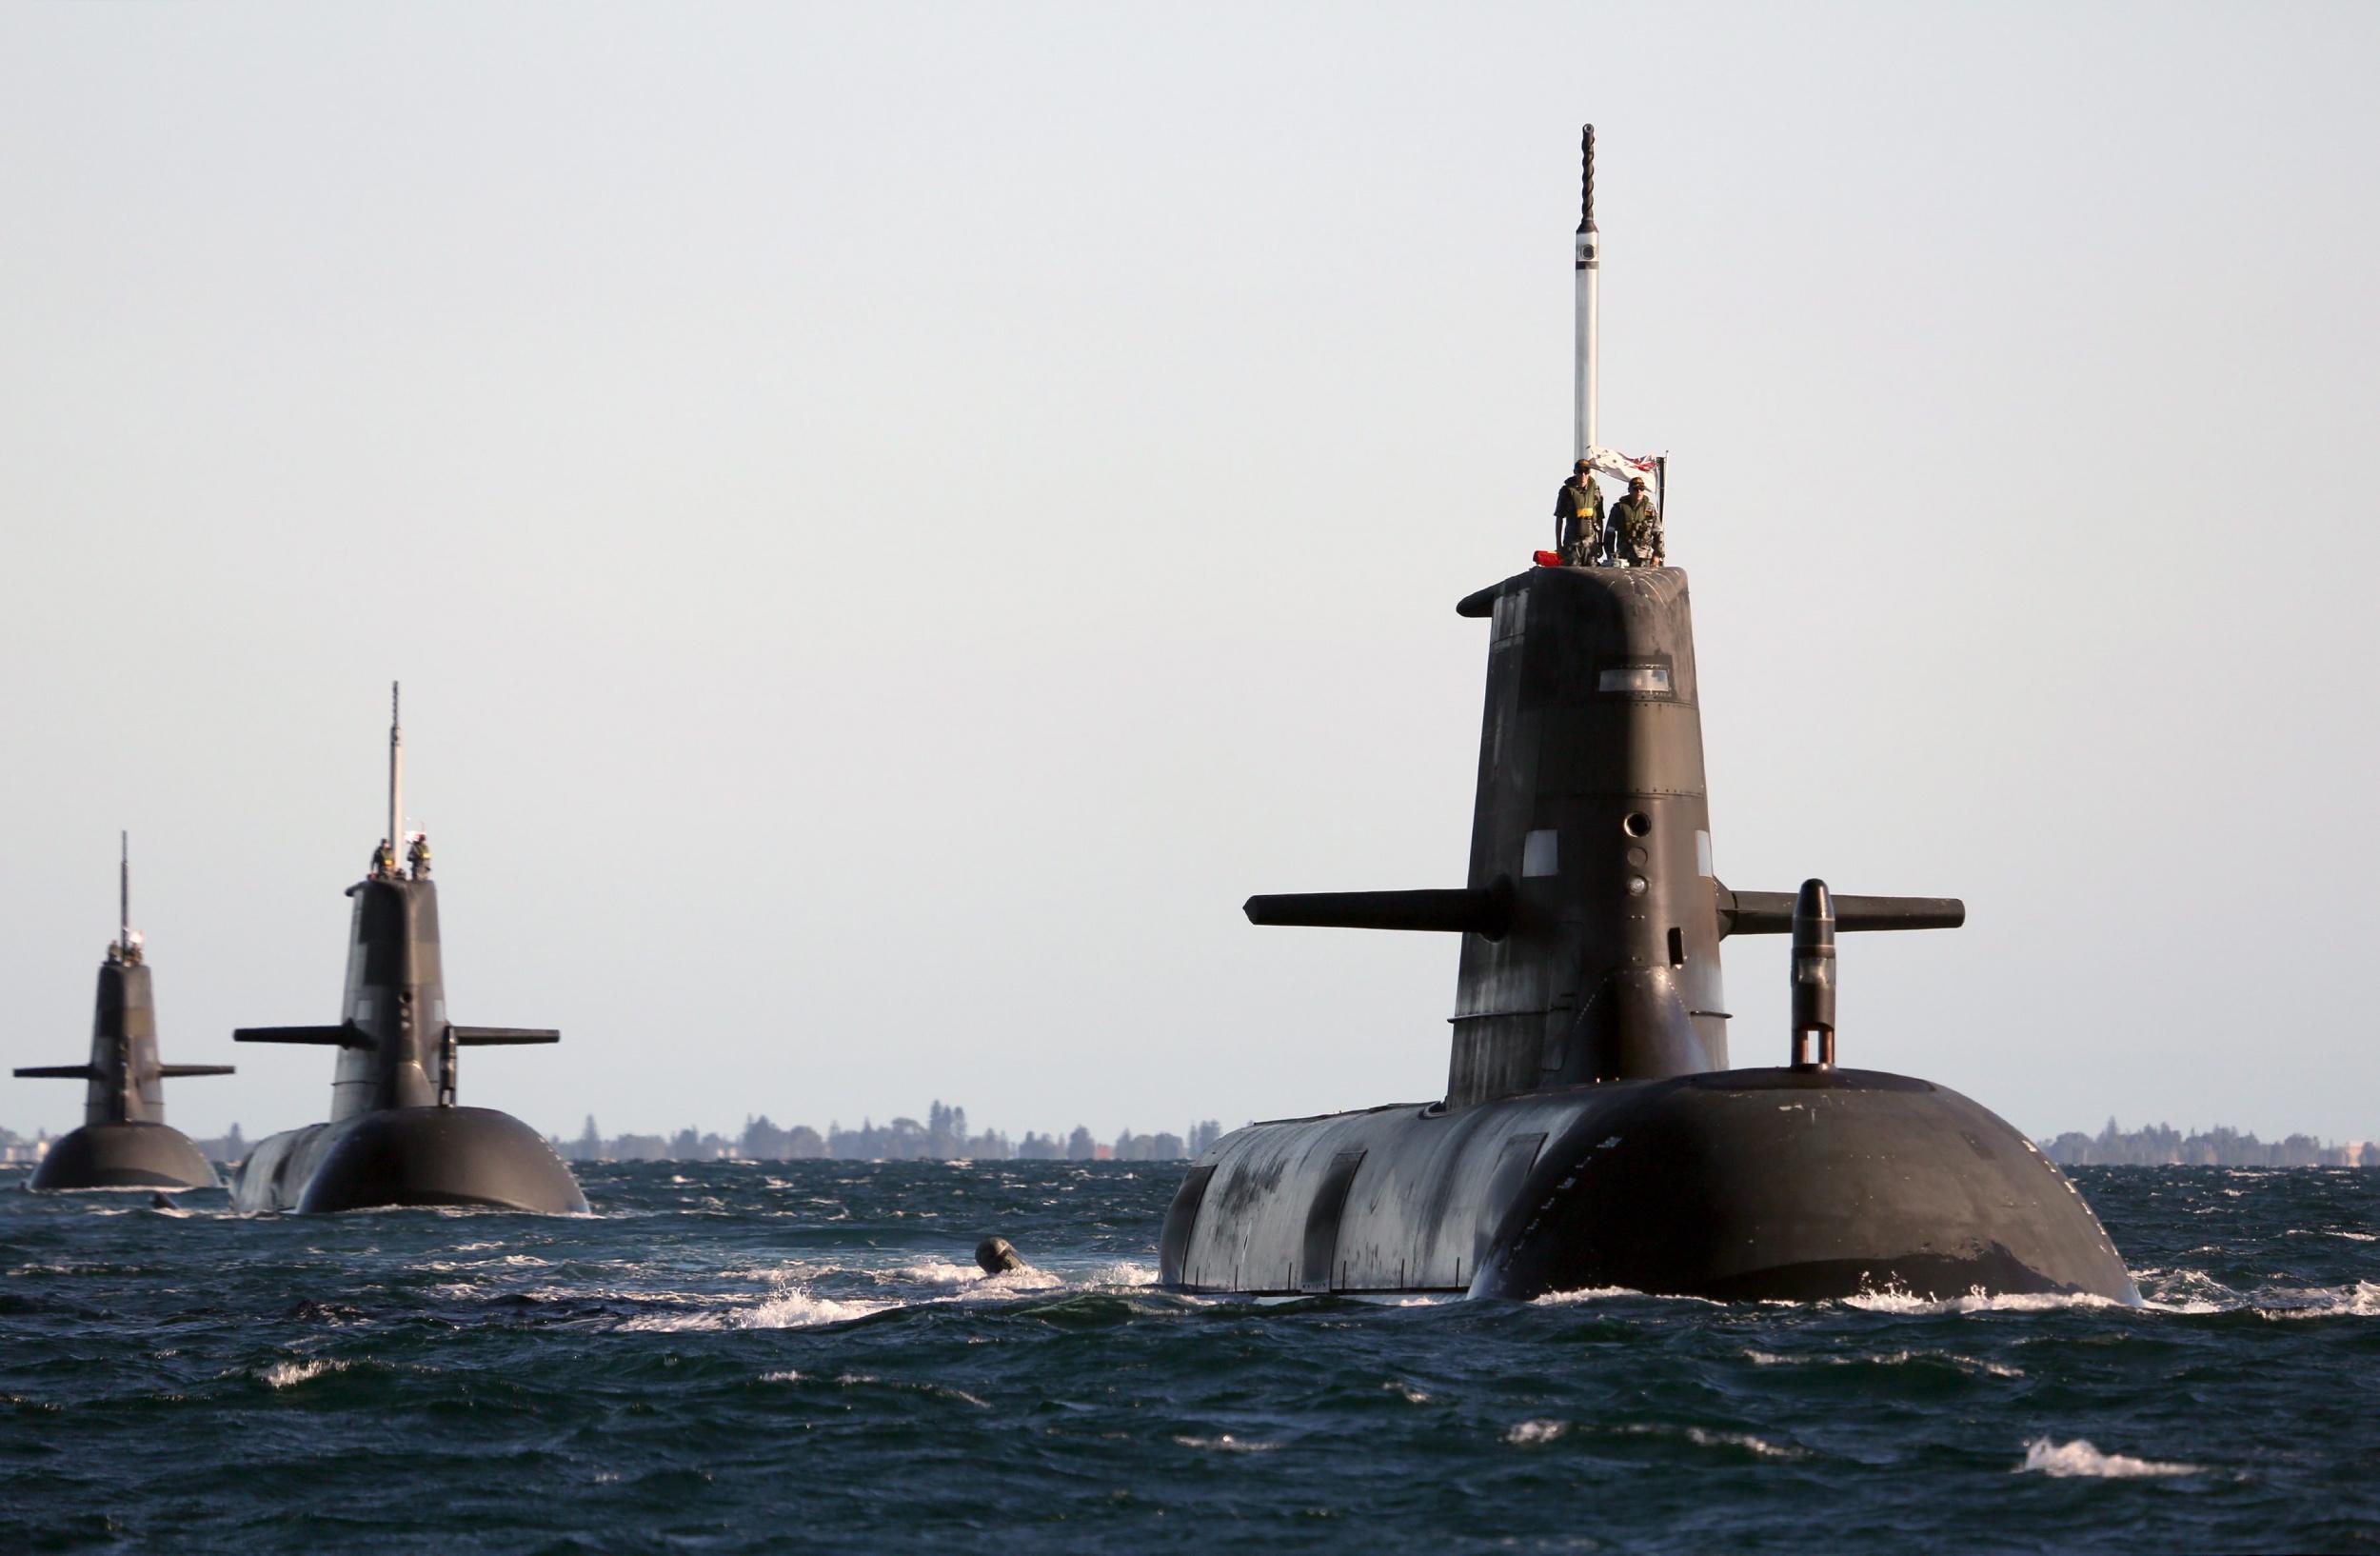 Collins-class attack boats HMAS Dechaineux leads HMAS Waller and HMAS Sheean in formation in Cockburn Sound, near Rockingham Western Australia in 2013. RAN Photo